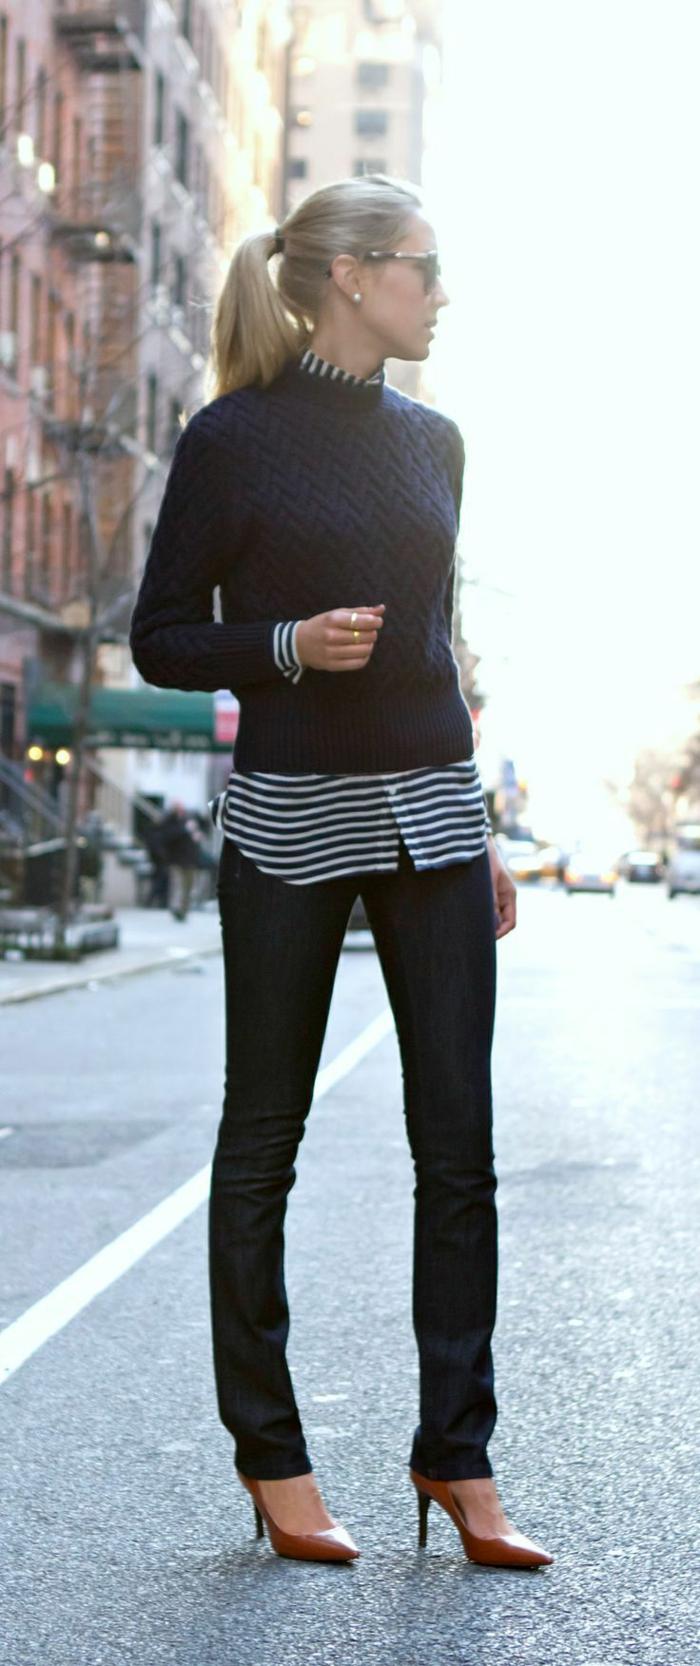 eleganter-Outfit-schwarze-Hosen-gestreiftes-Hemd-kurzer-gestrickter-Pullover